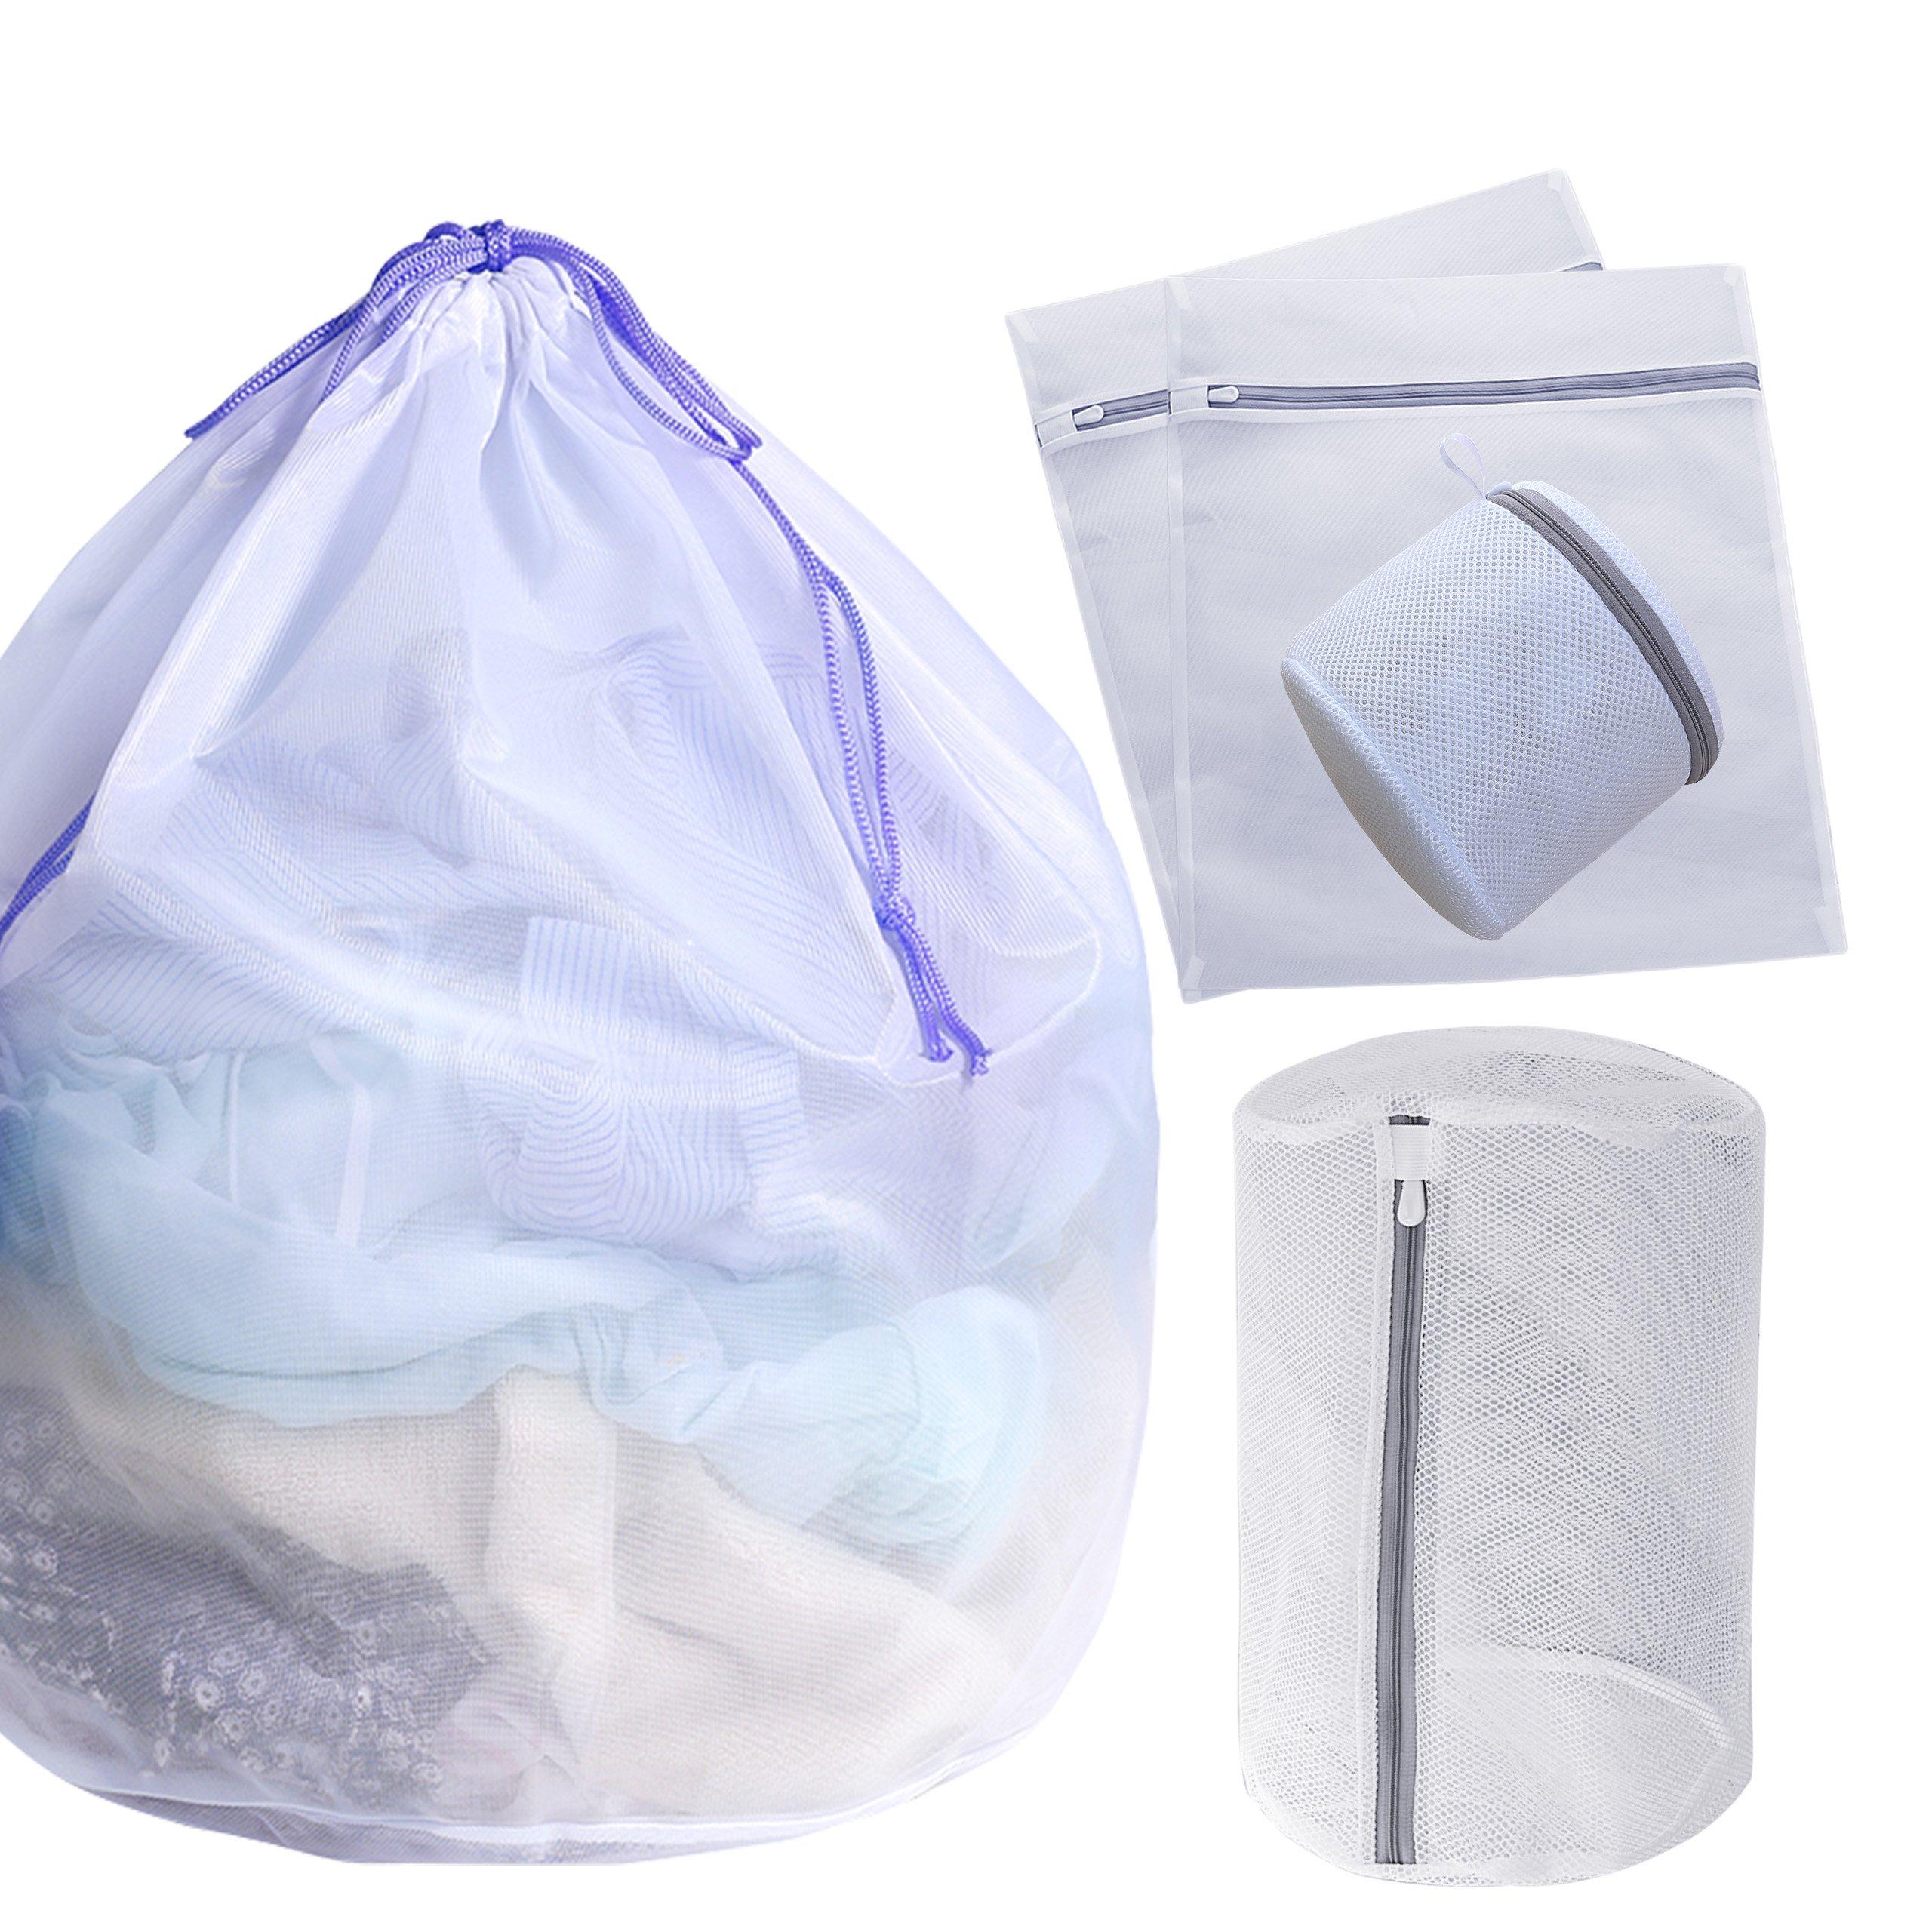 Set of 5 Mesh Laundry Bags-1 Jumbo, 2 Large, 1 Medium and 1 Mini Laundry Wash Bags for Coat, Jackets, Sweaters, Undies, Bras, Children Socks,Blouse, Hosiery, Lingerie (Jumbo Size Fine Mesh)